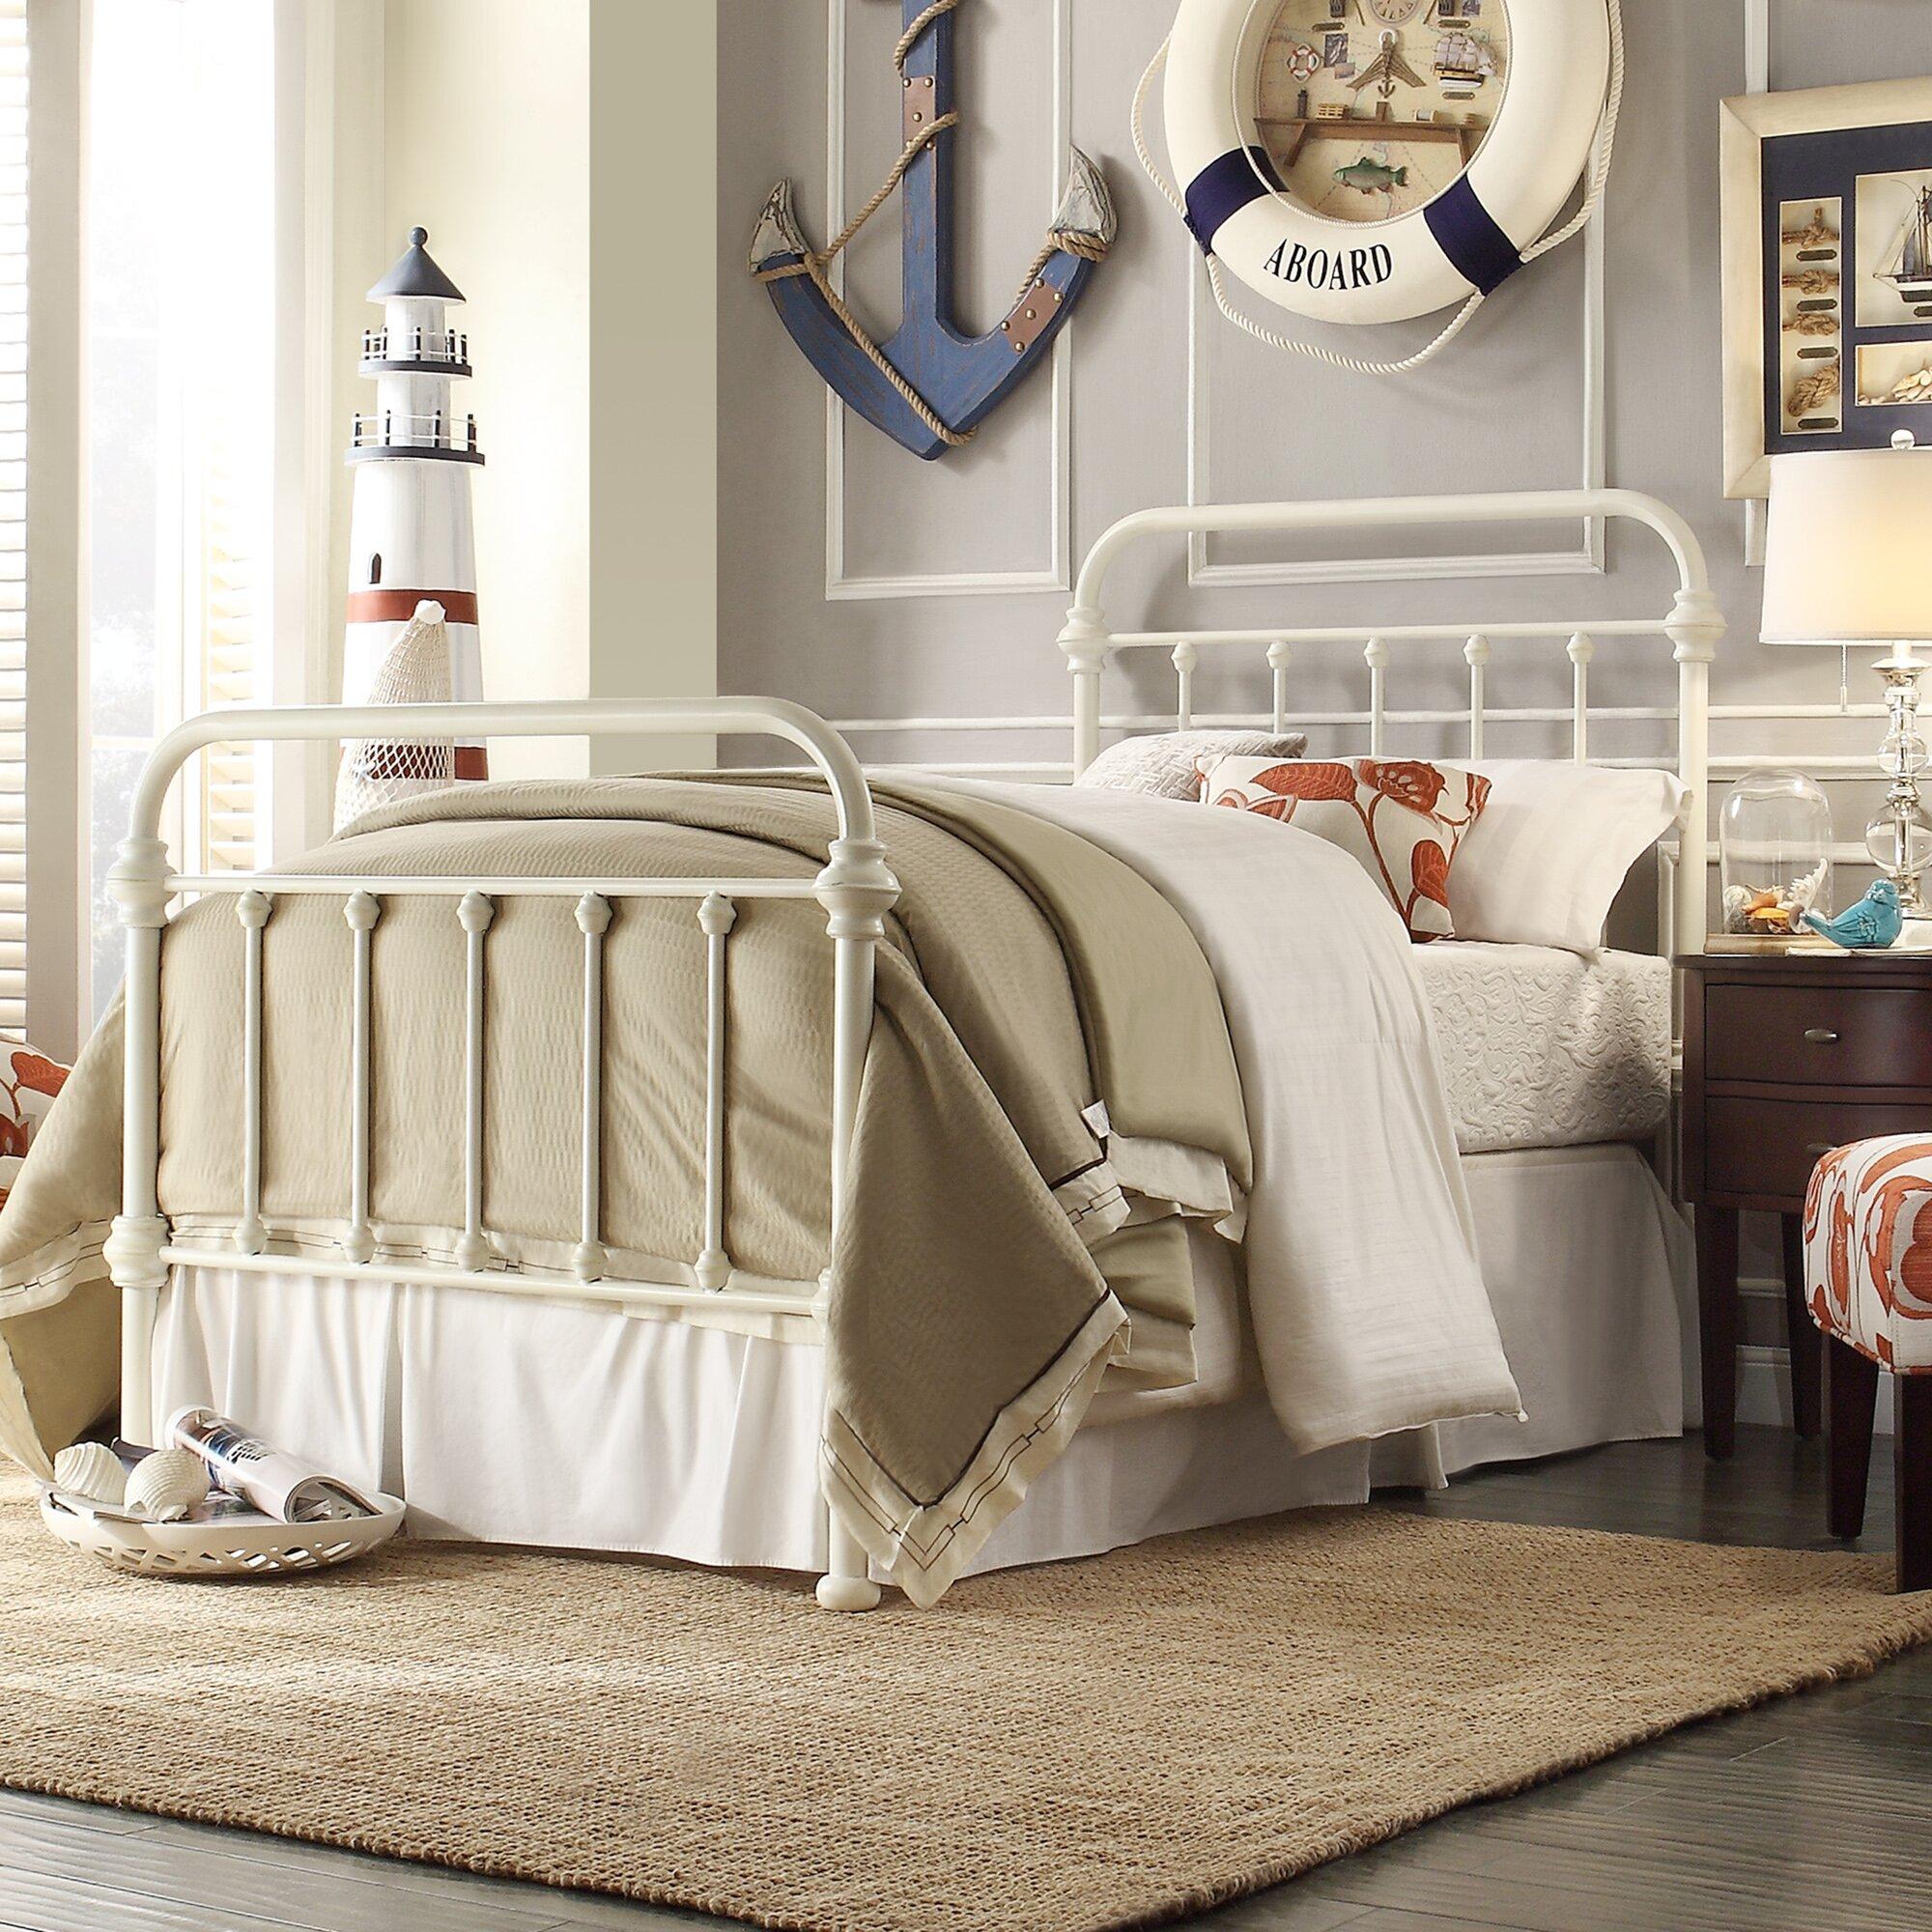 Laroche Panel Bed King